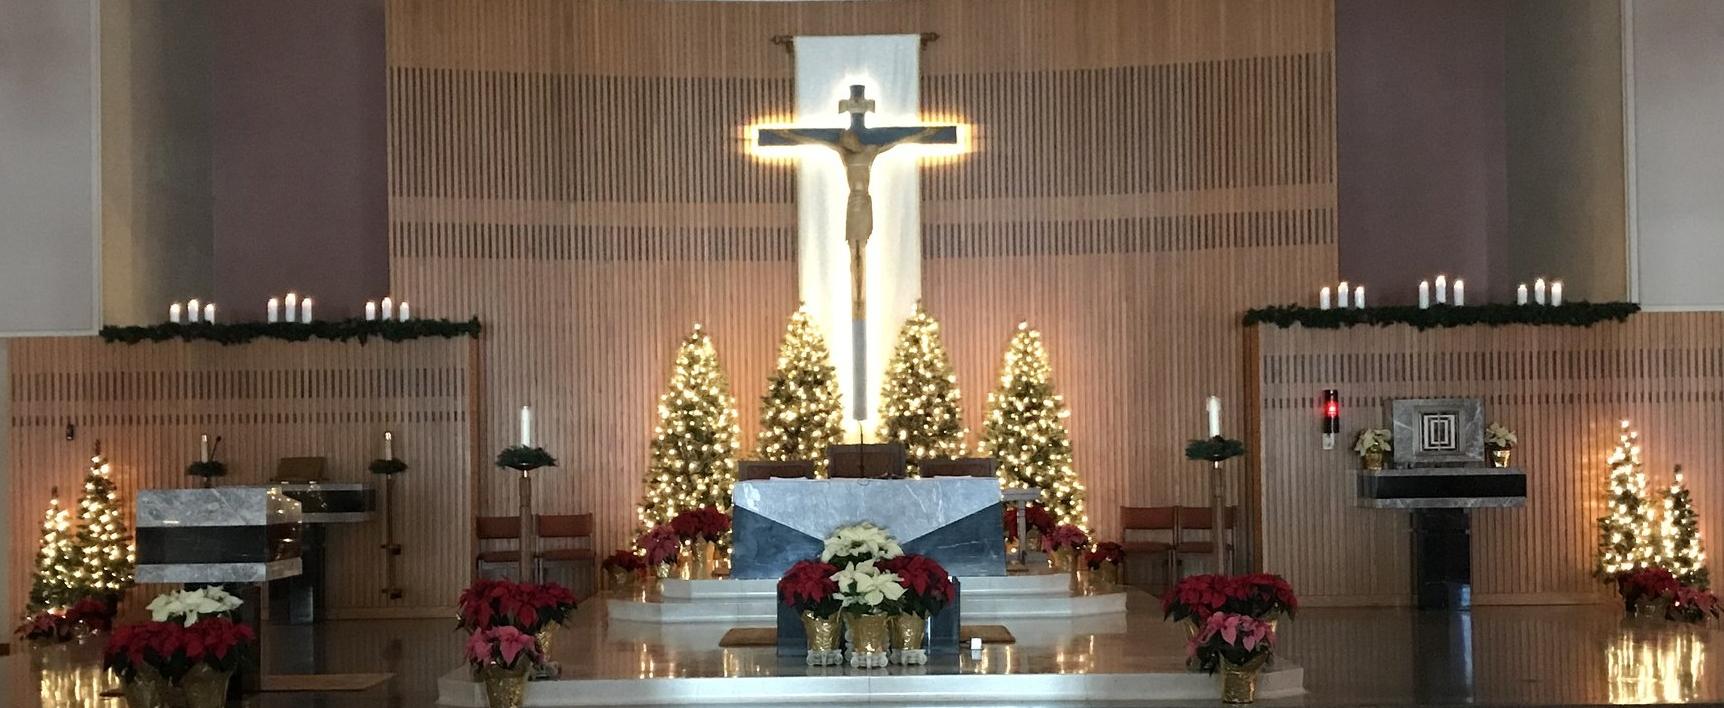 2017 Christmas sanctuary lights.jpg